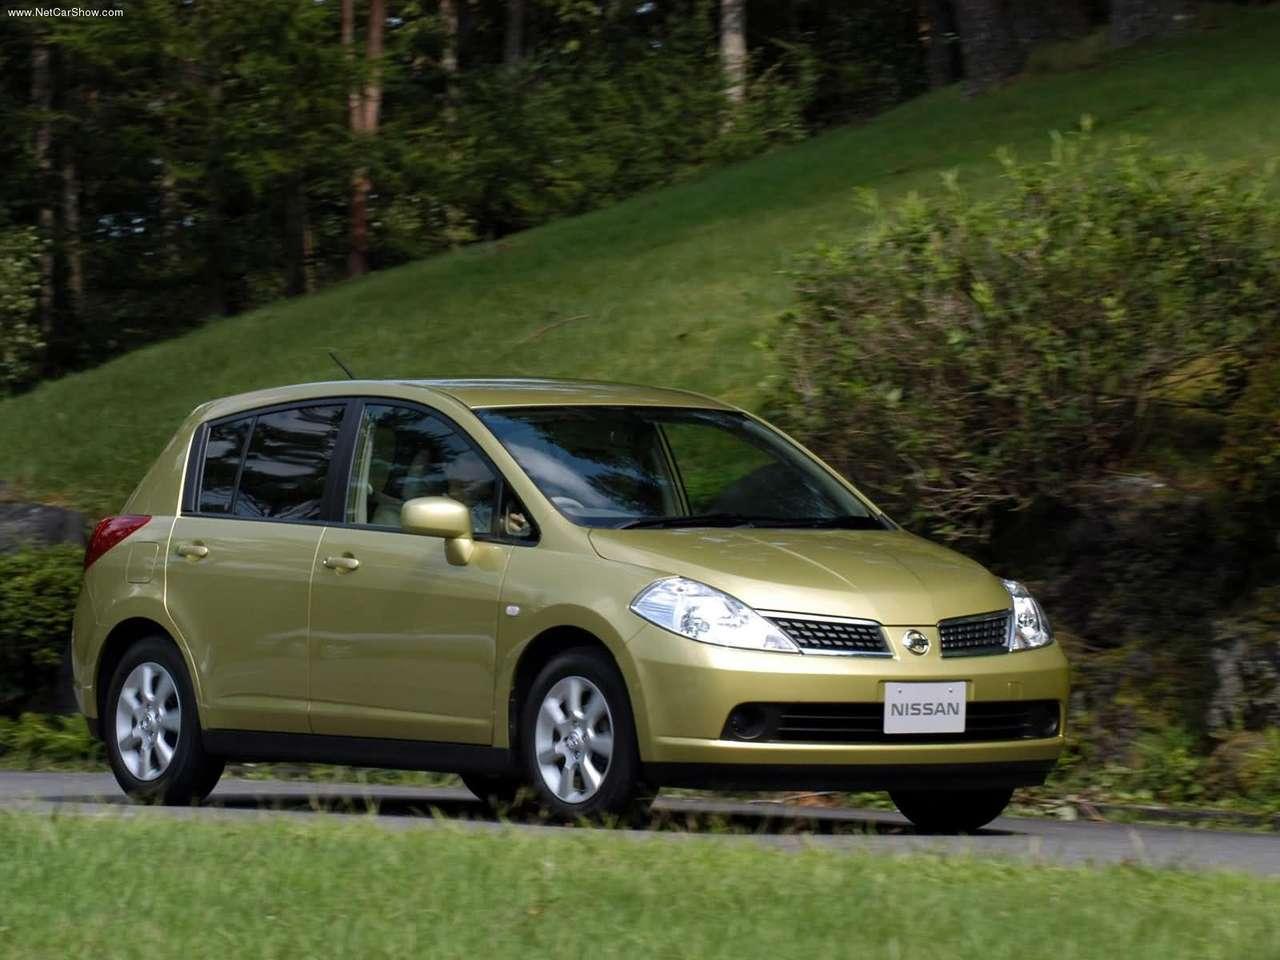 http://4.bp.blogspot.com/-8hr-SNOQnLk/TXtImaQlv4I/AAAAAAAAFaY/KdlVIiPm2mo/s1600/Nissan-Tiida_2004_1280x960_wallpaper_02.jpg